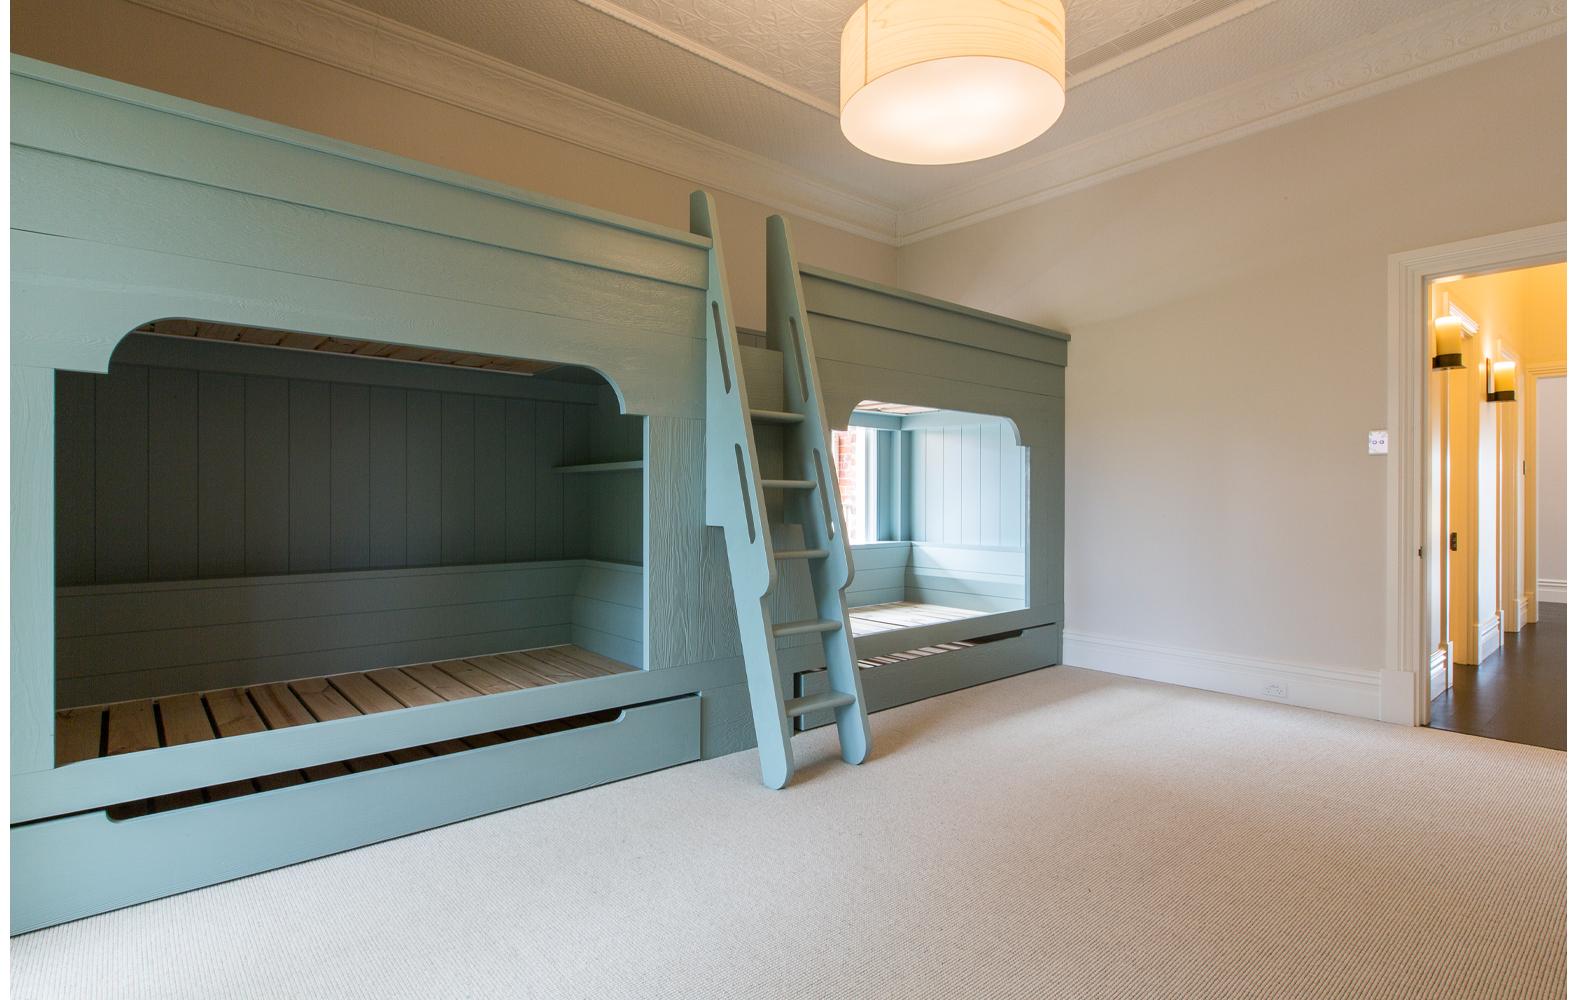 maek-luxury-home-design-inspiration-toodyay-childrens-bedroom-gallery-14.jpg